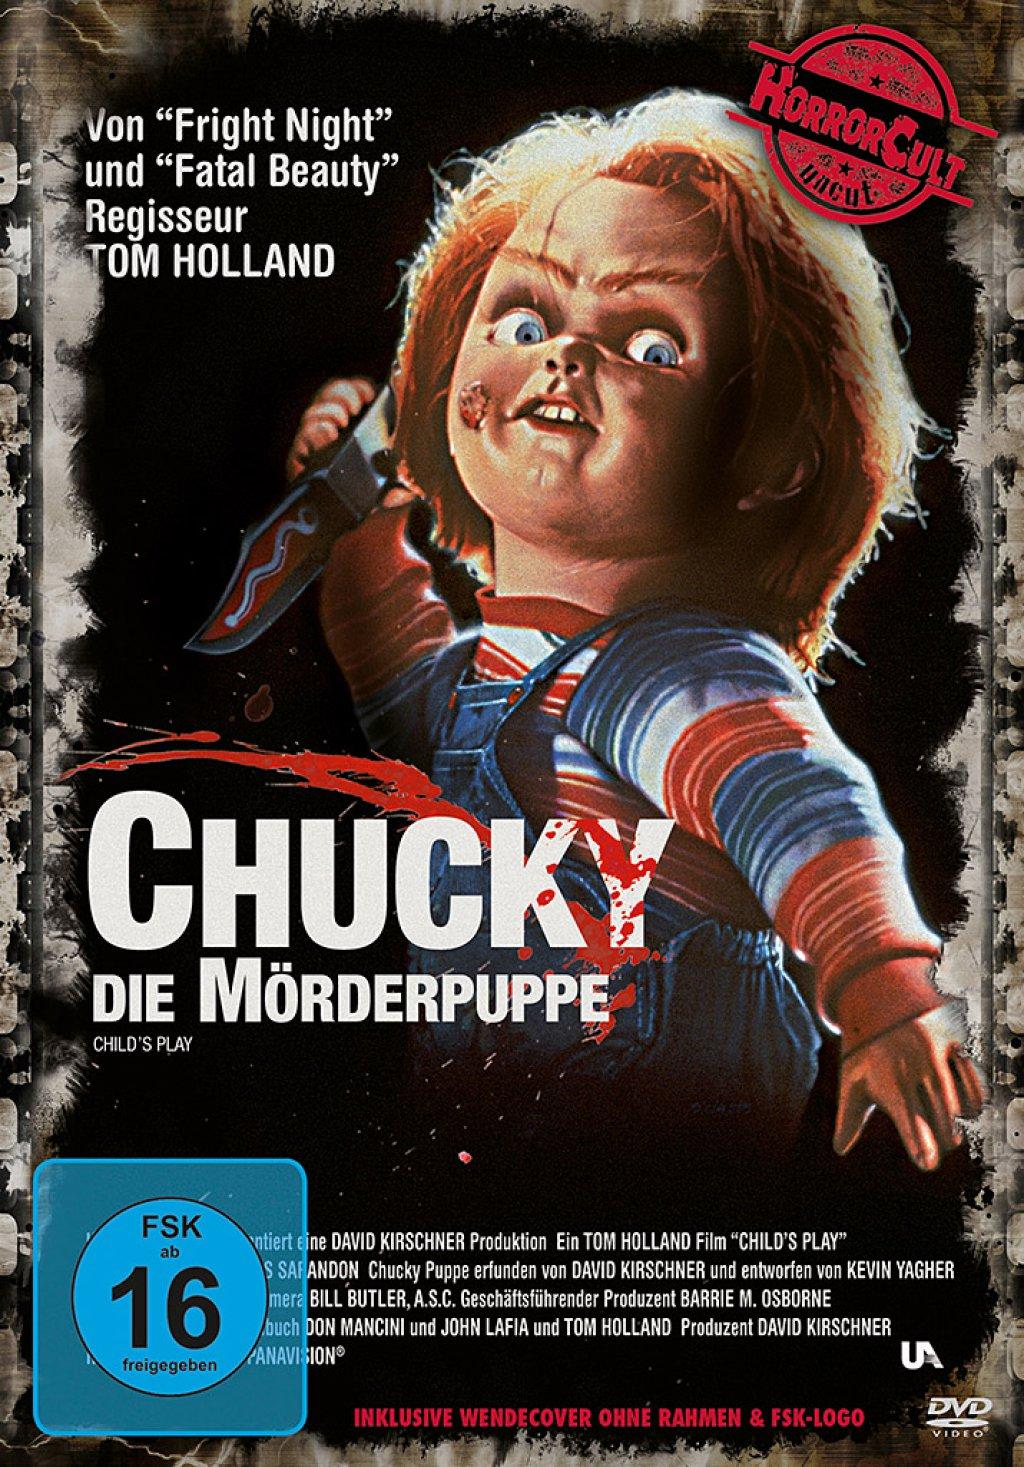 Chucky 1 - Die Mörderpuppe - Horror Cult Uncut (DVD)